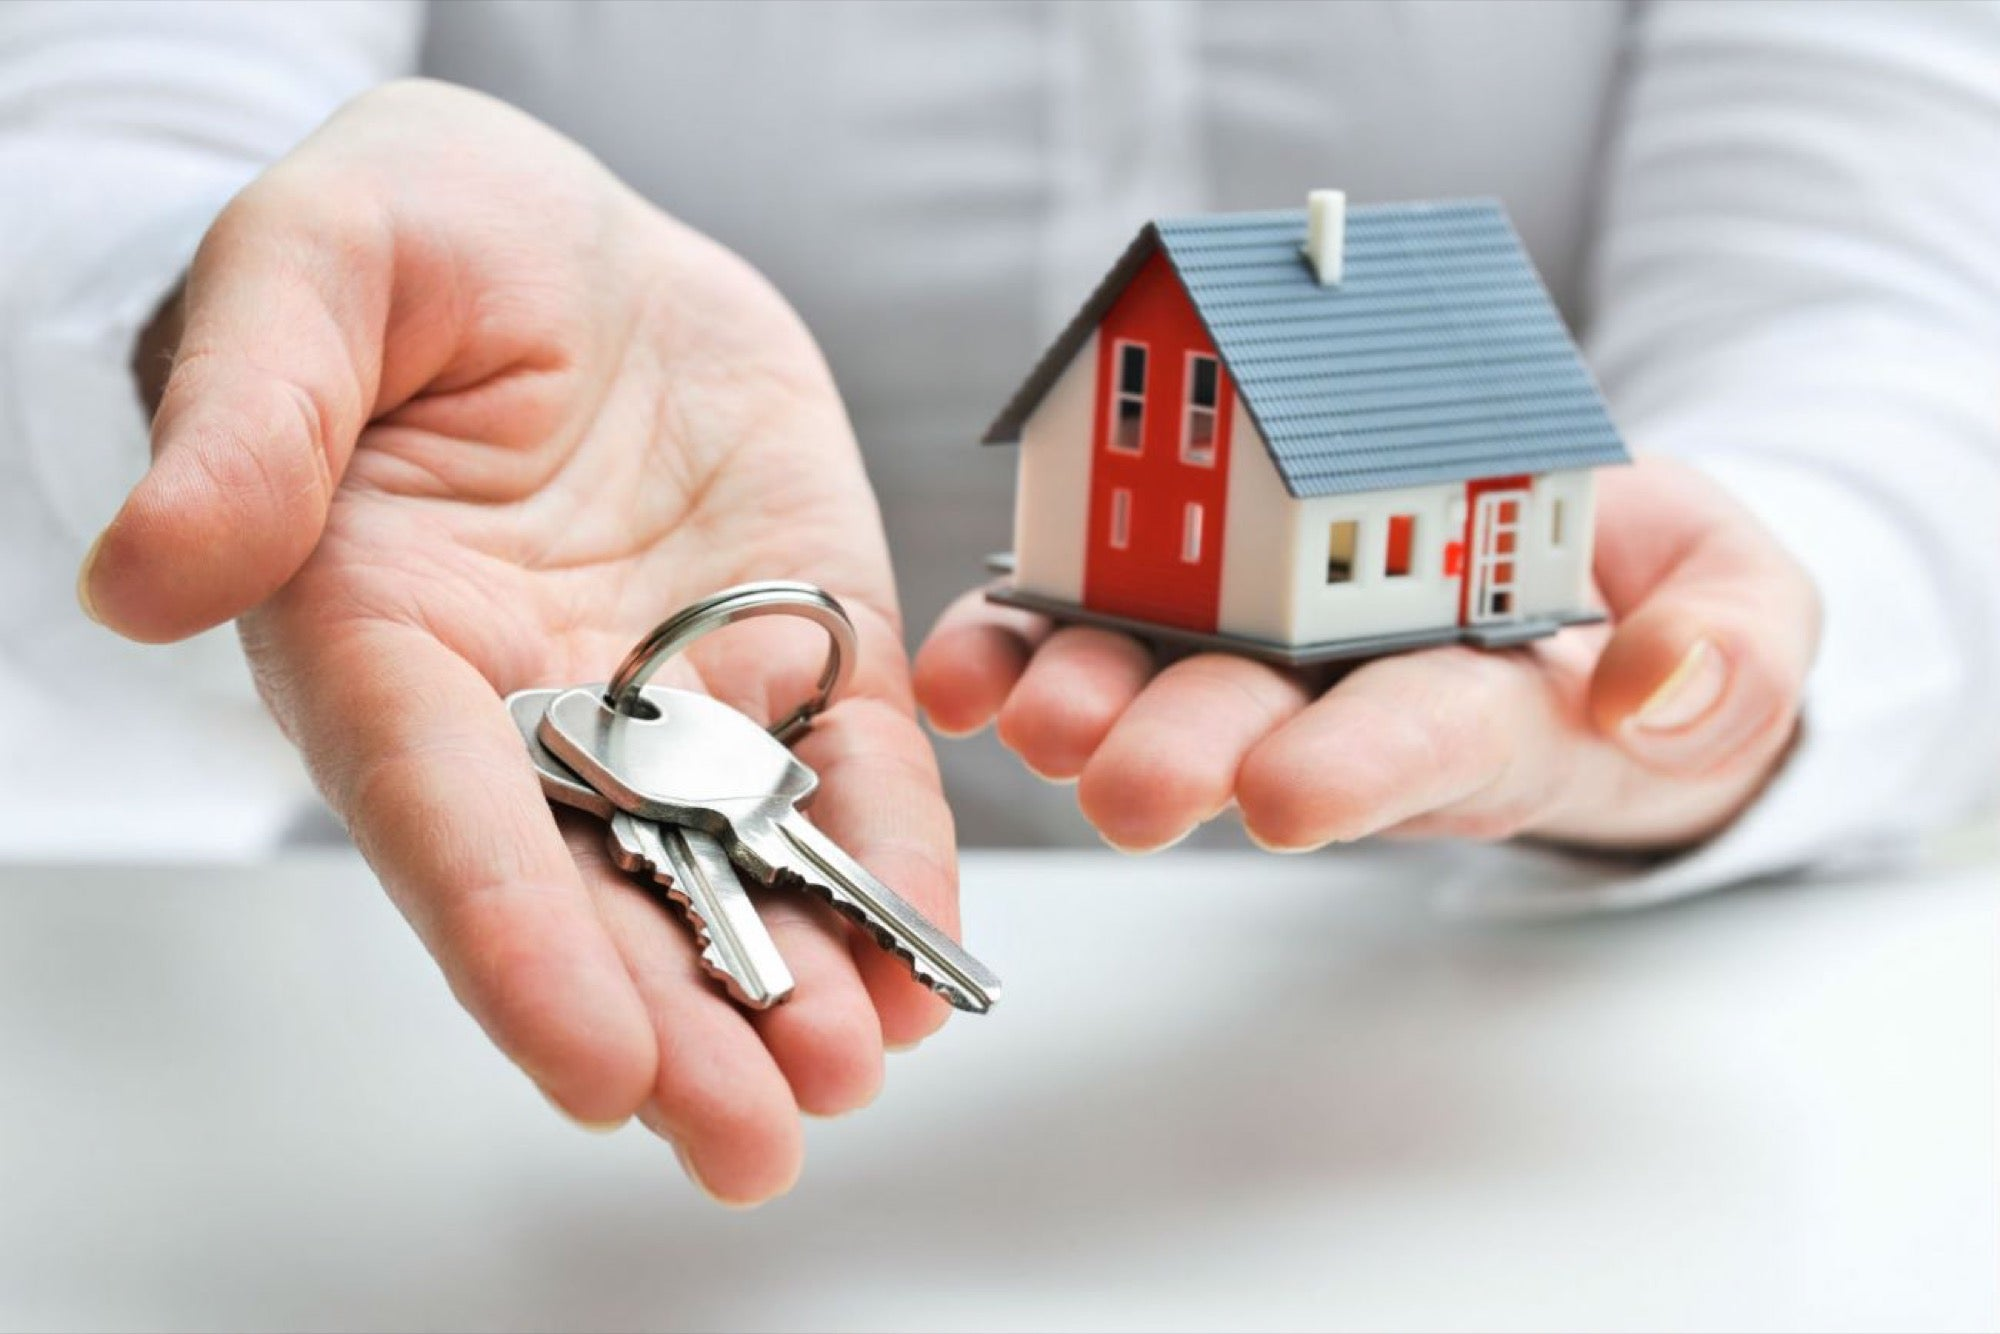 alquilar viviendas dnp